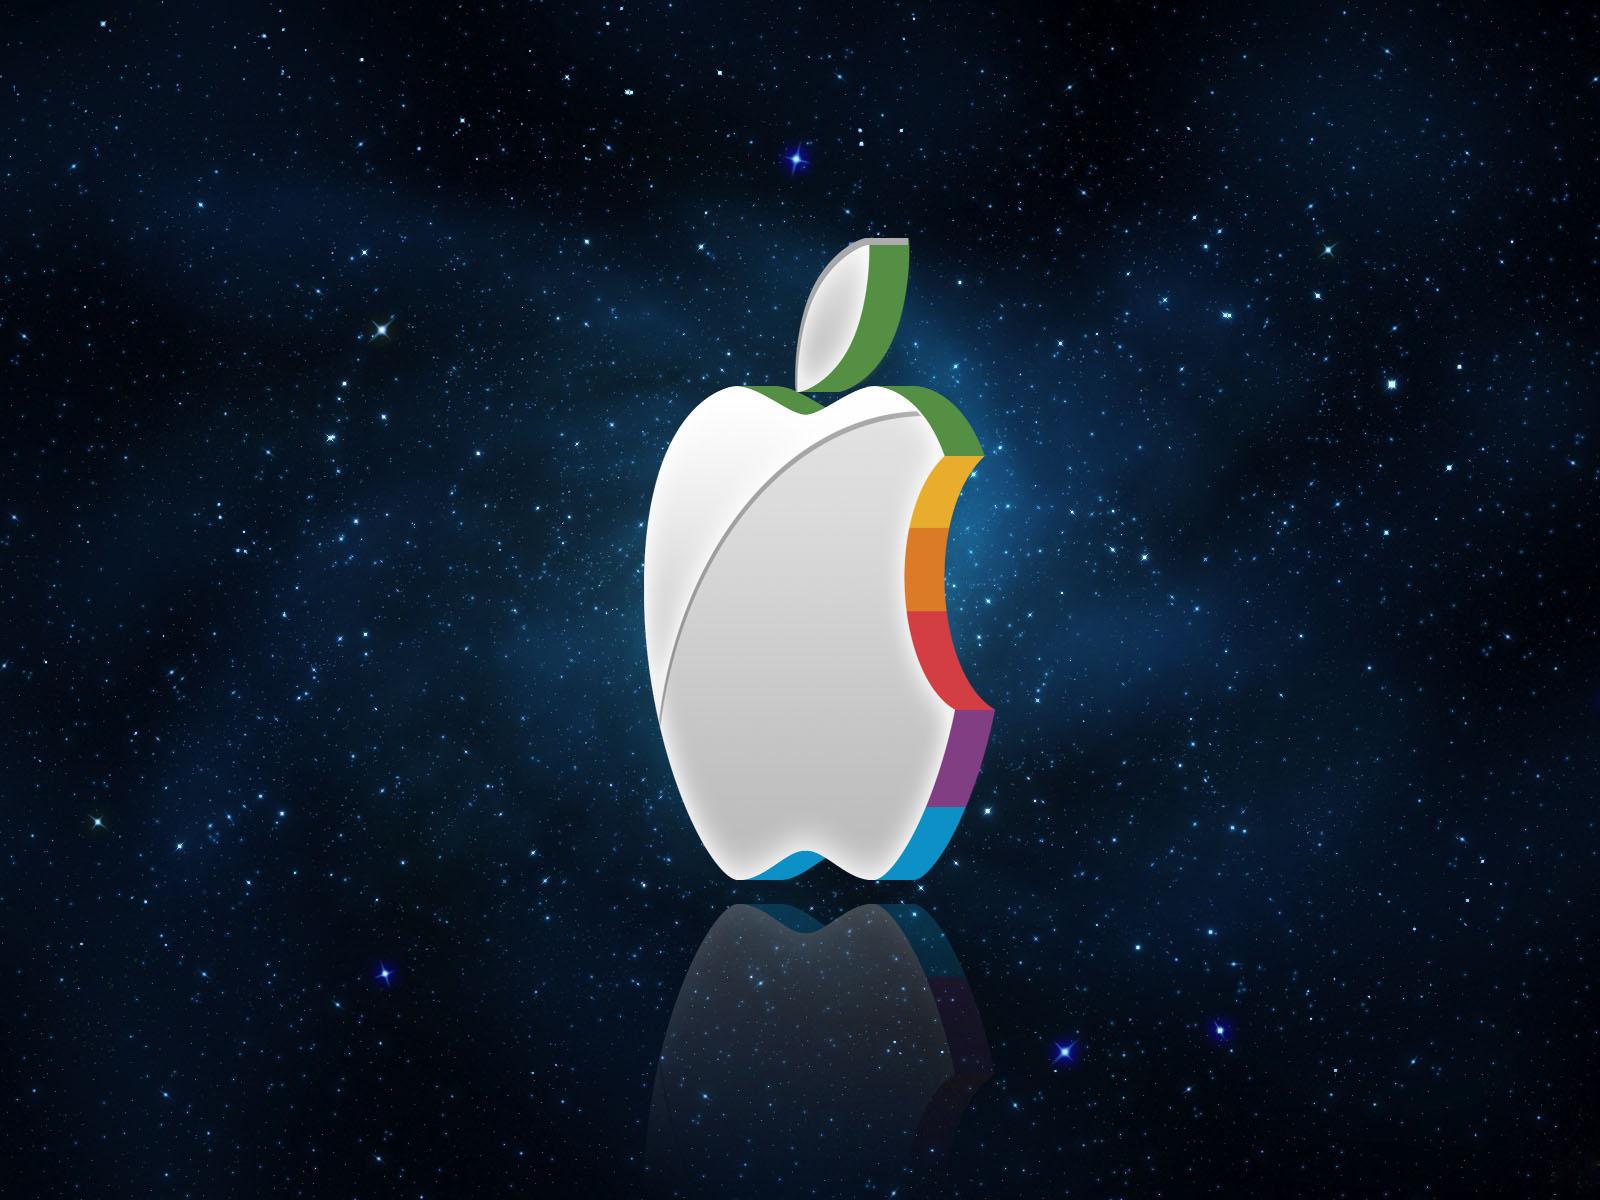 Gambar Logo Apple Terkeren